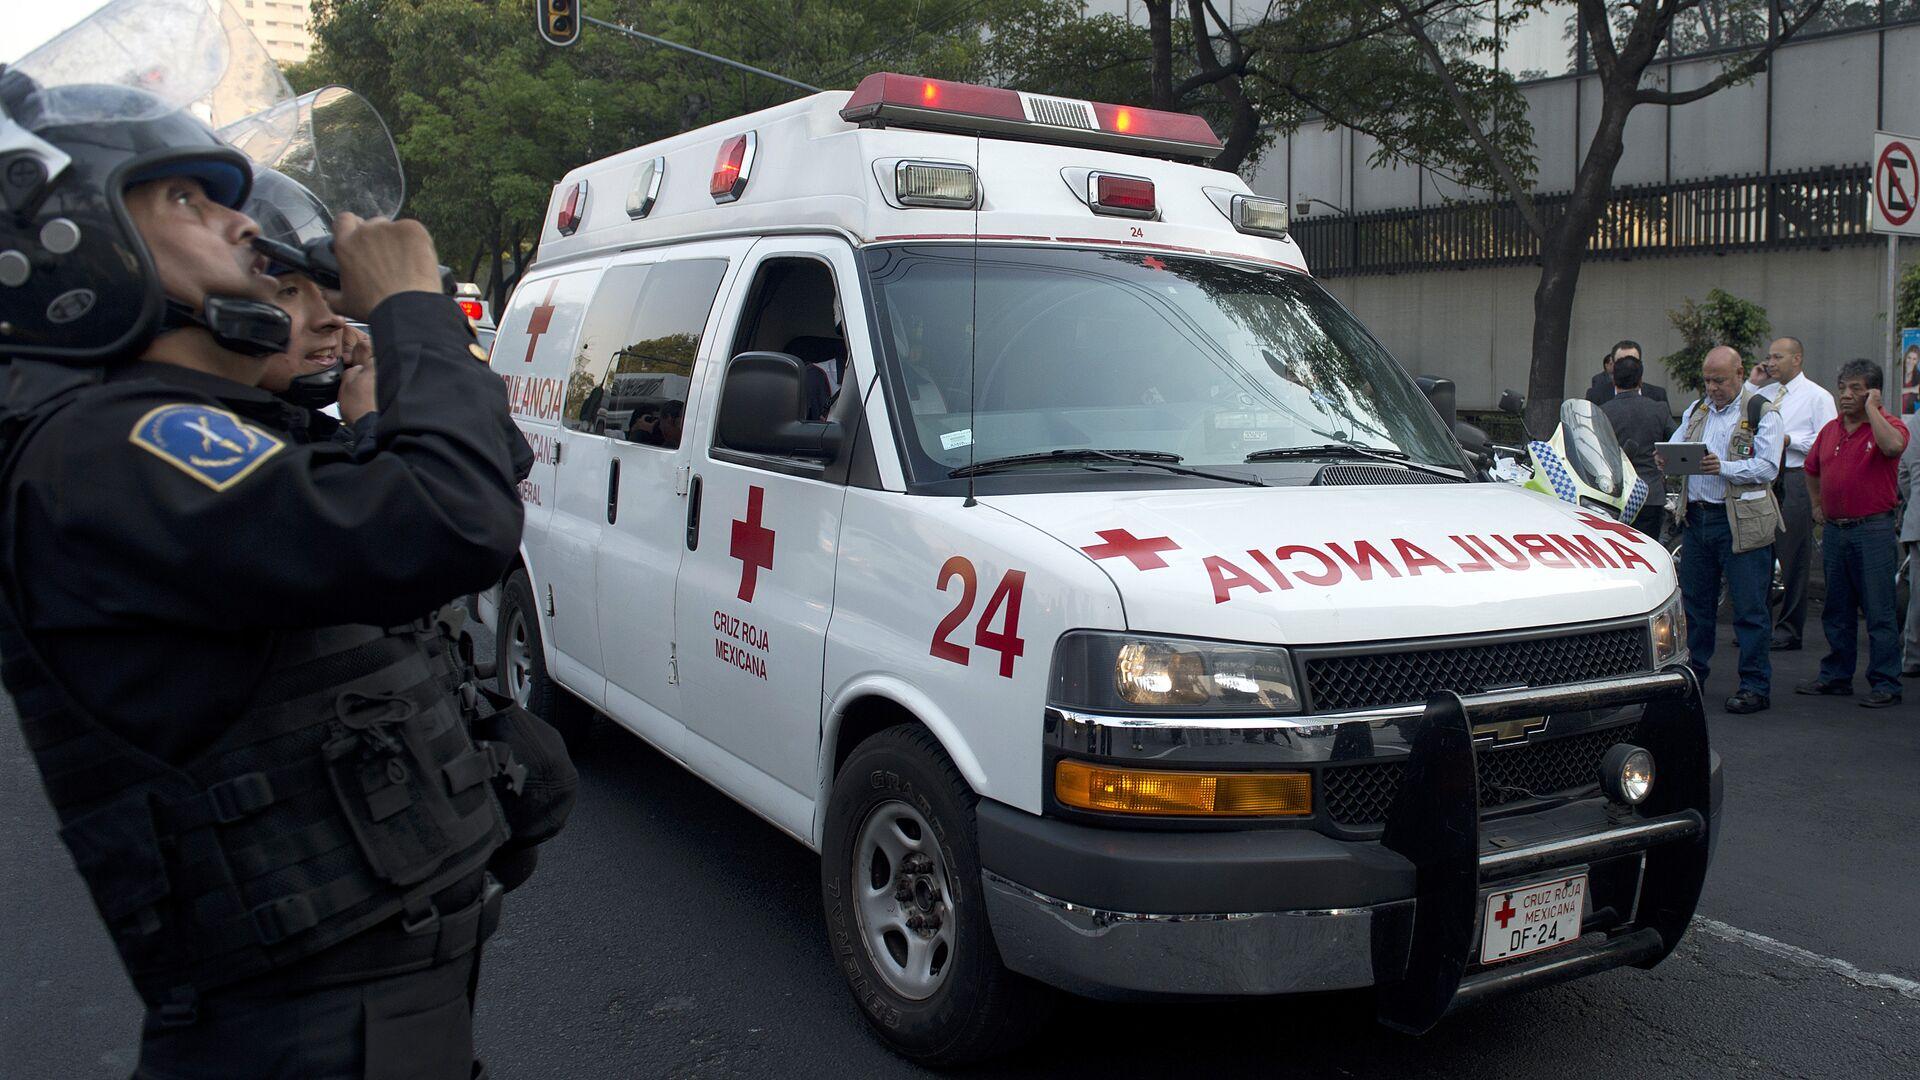 Una ambulancia mexicana (archivo) - Sputnik Mundo, 1920, 15.06.2021